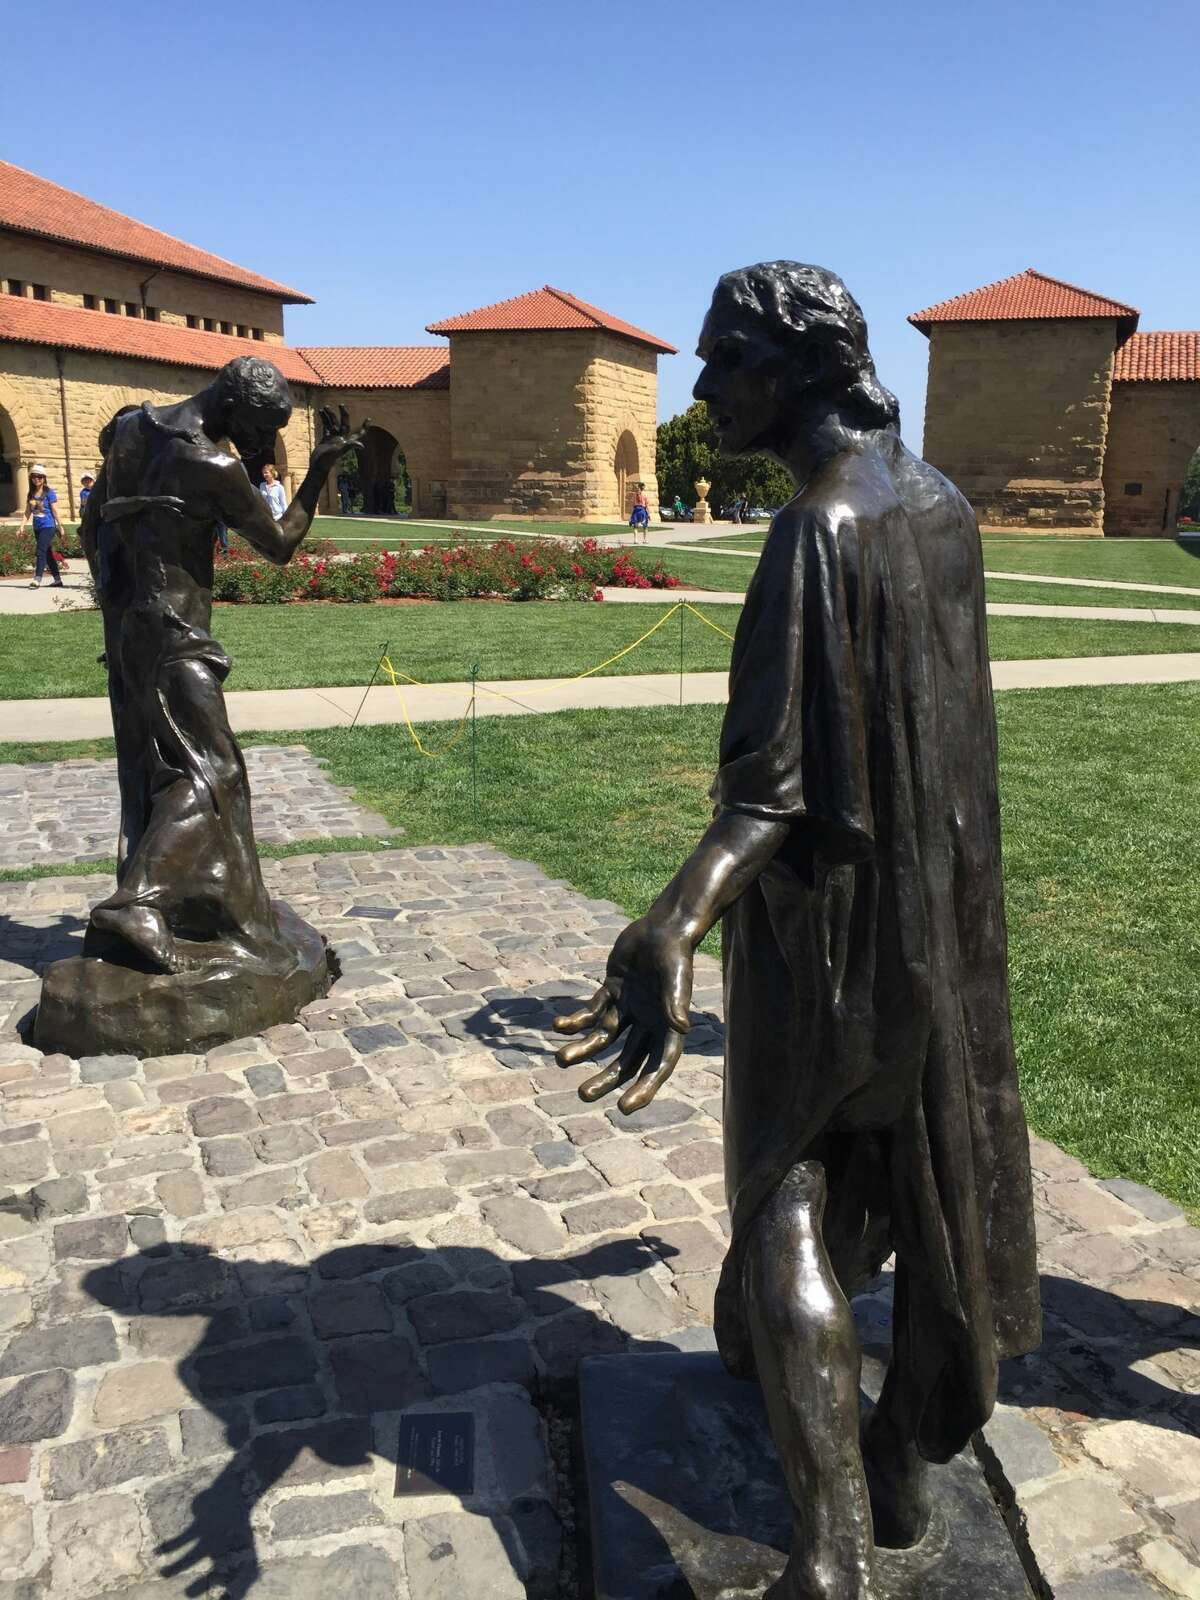 2. Stanford Highest ranking: Alumni survey, salary: 1 Lowest ranking: Job placement: 57 Source:Bloomberg Businessweek